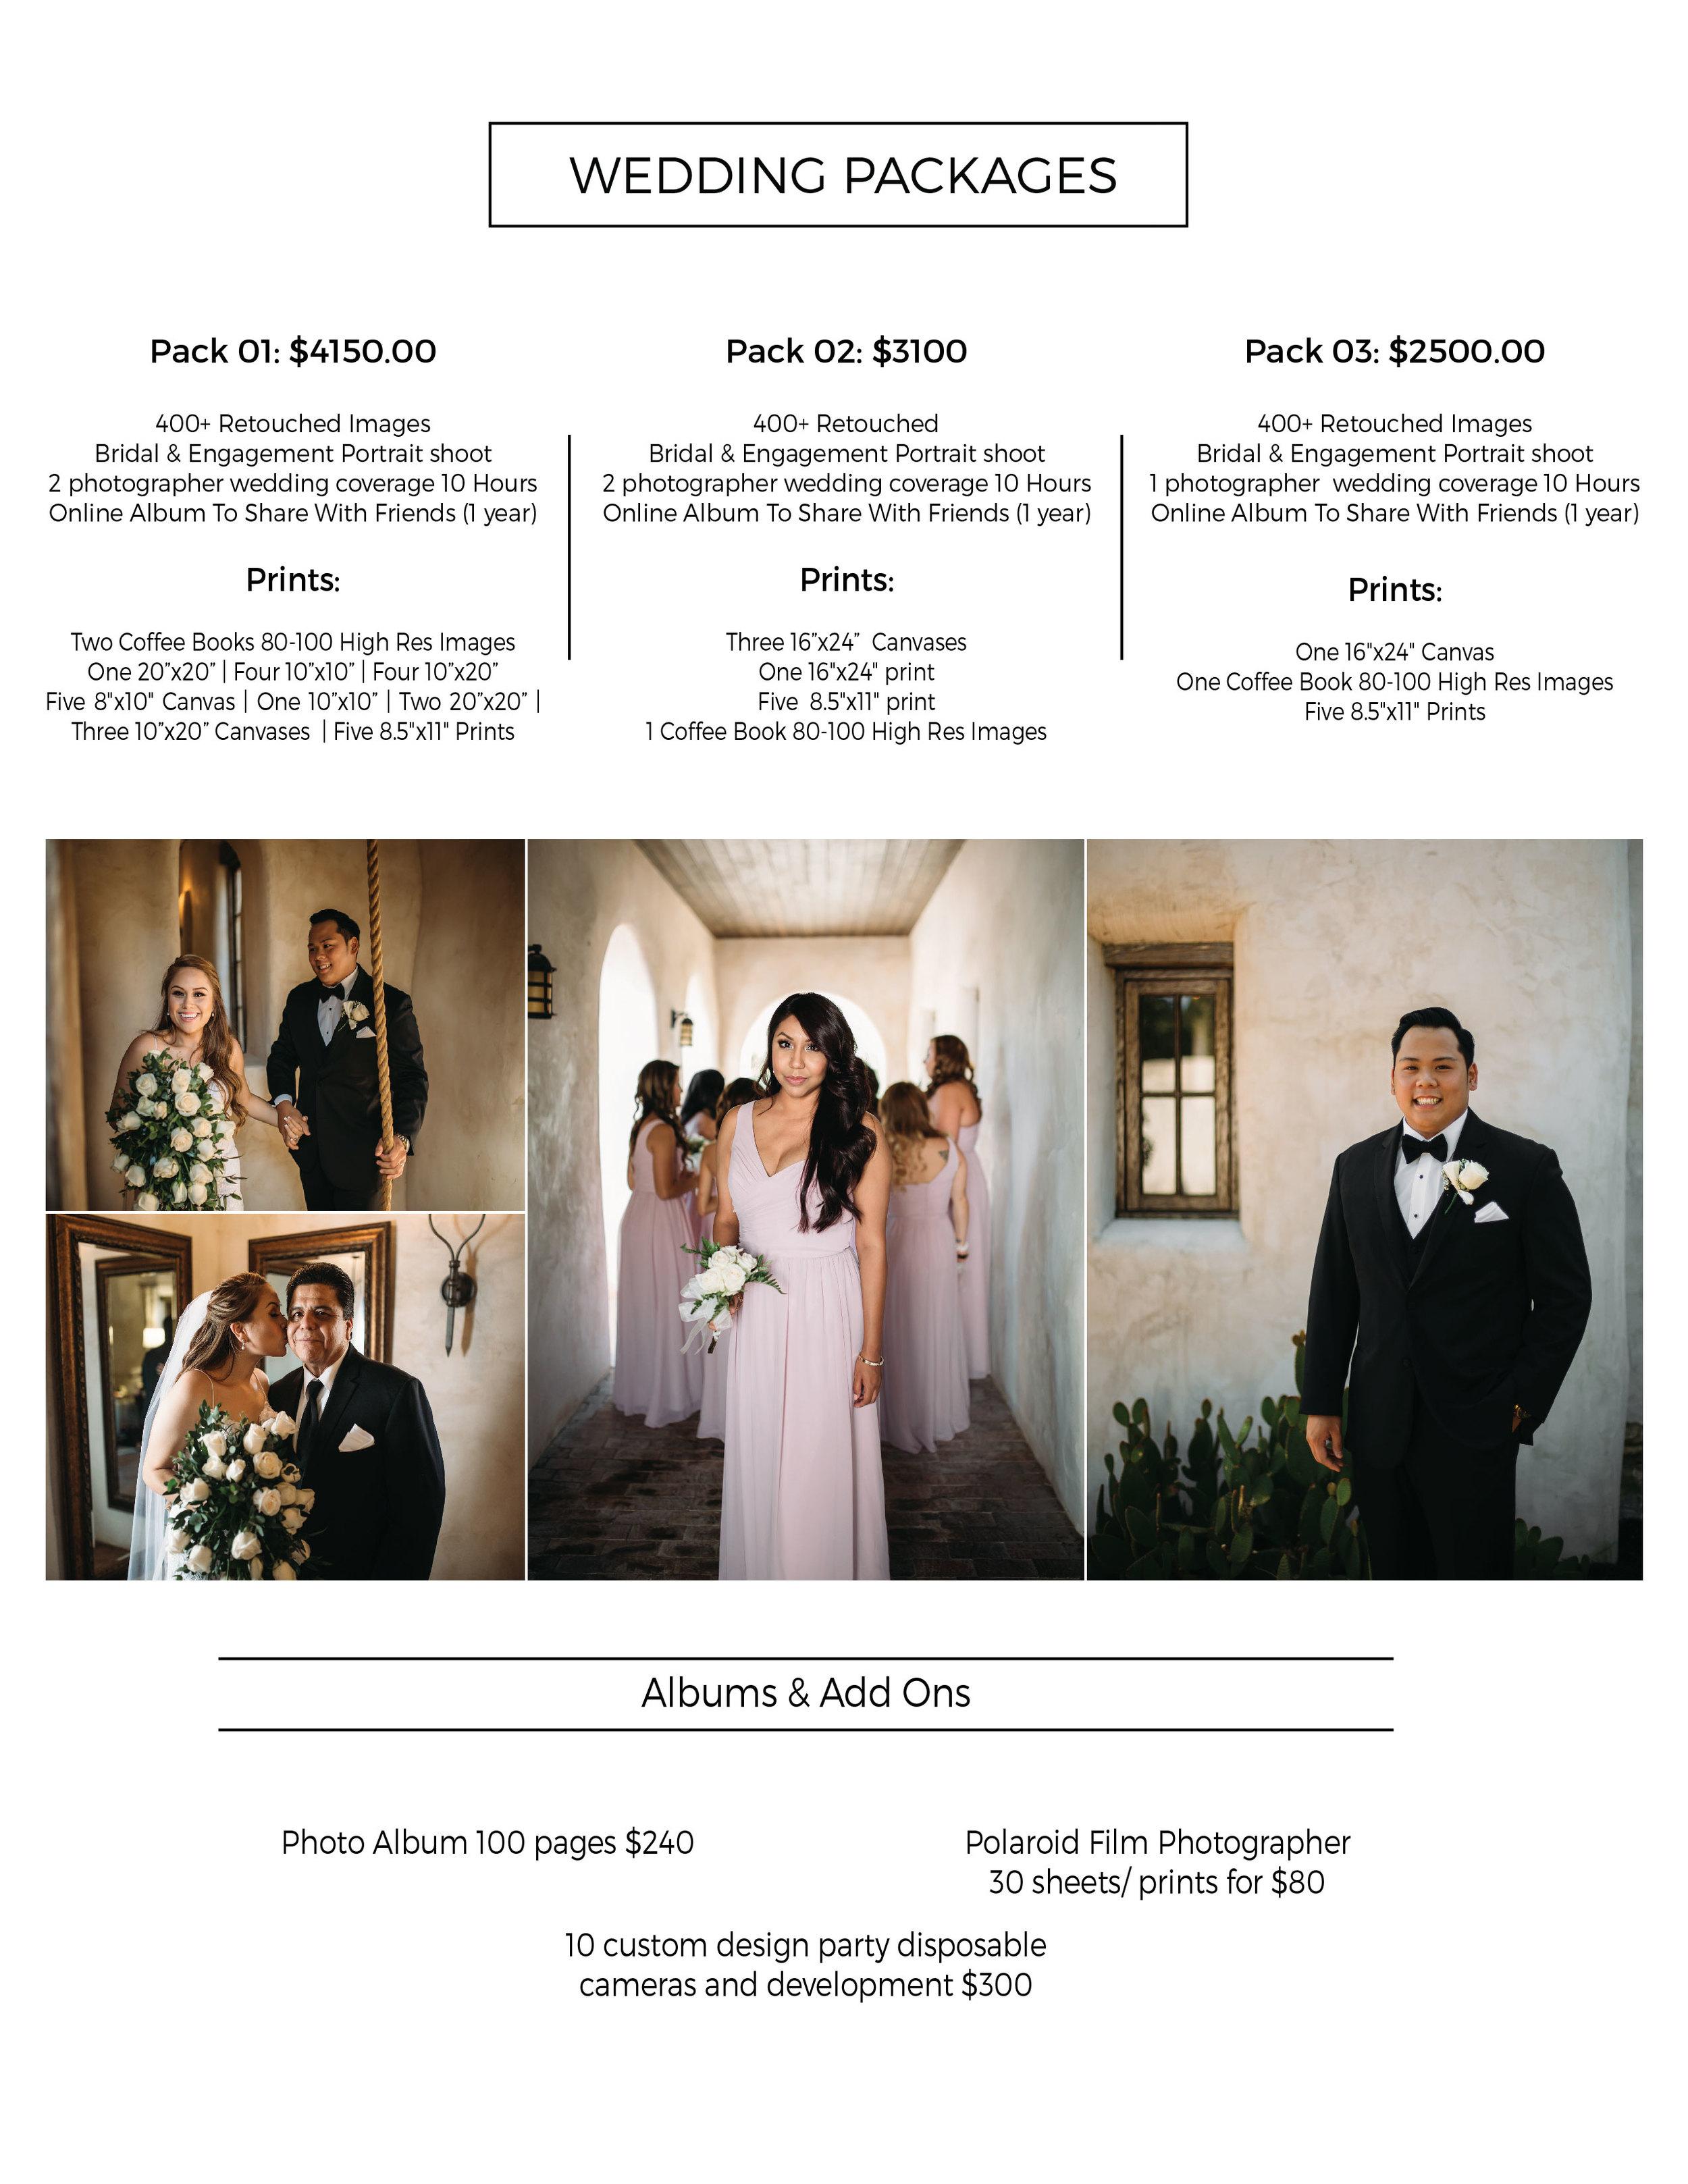 WeddingCollections-02.jpg